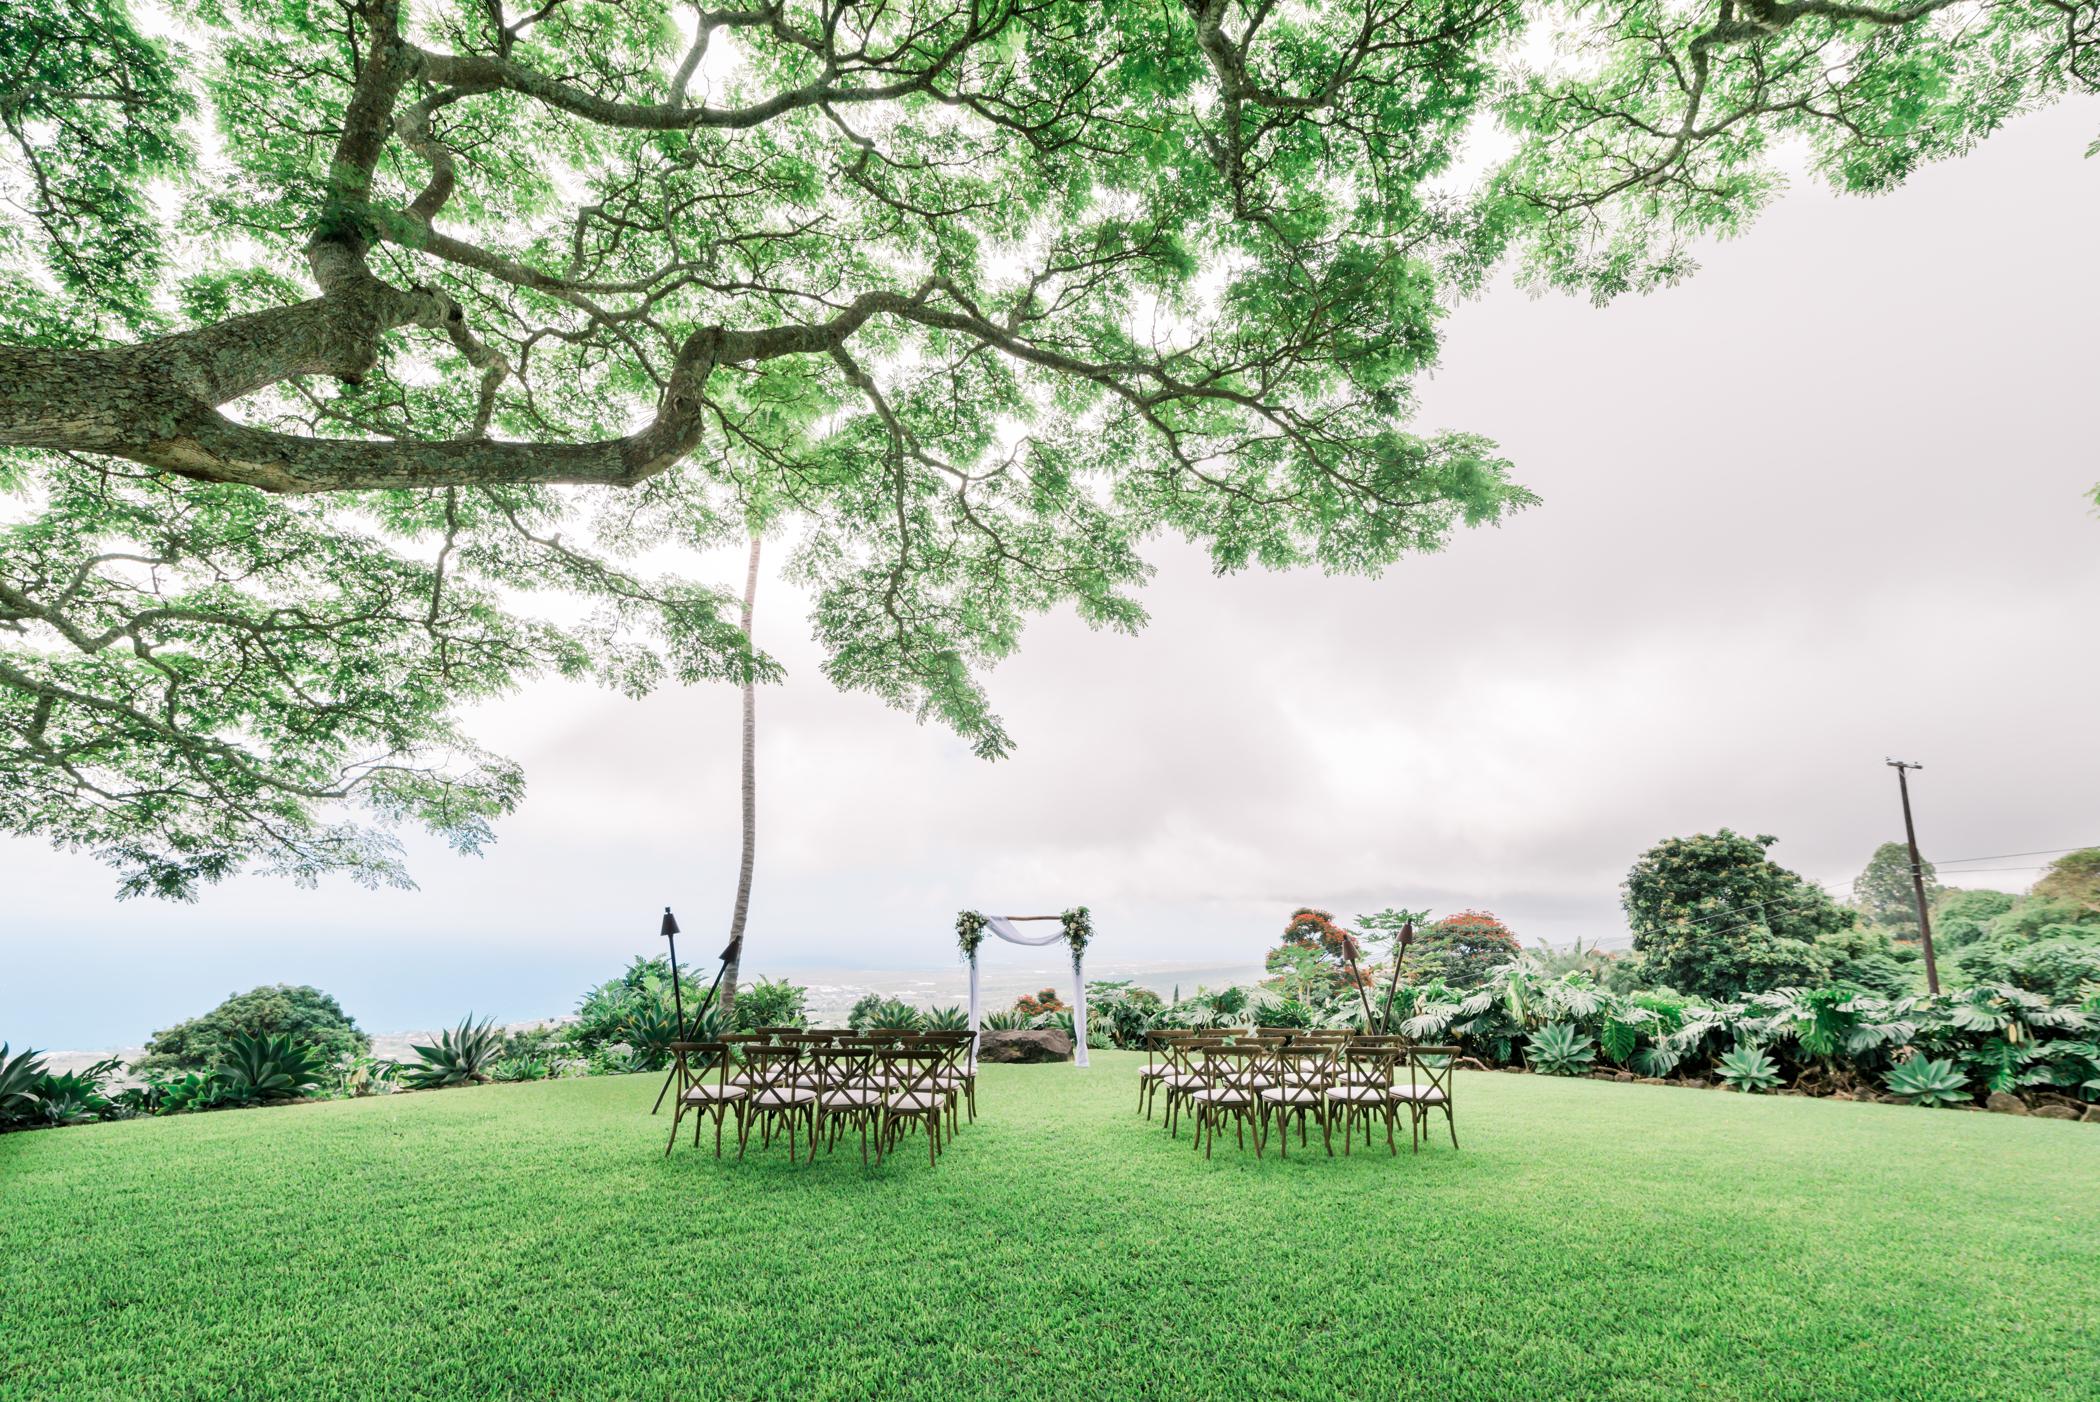 Stunning wedding ceremony at our Big Island wedding venue